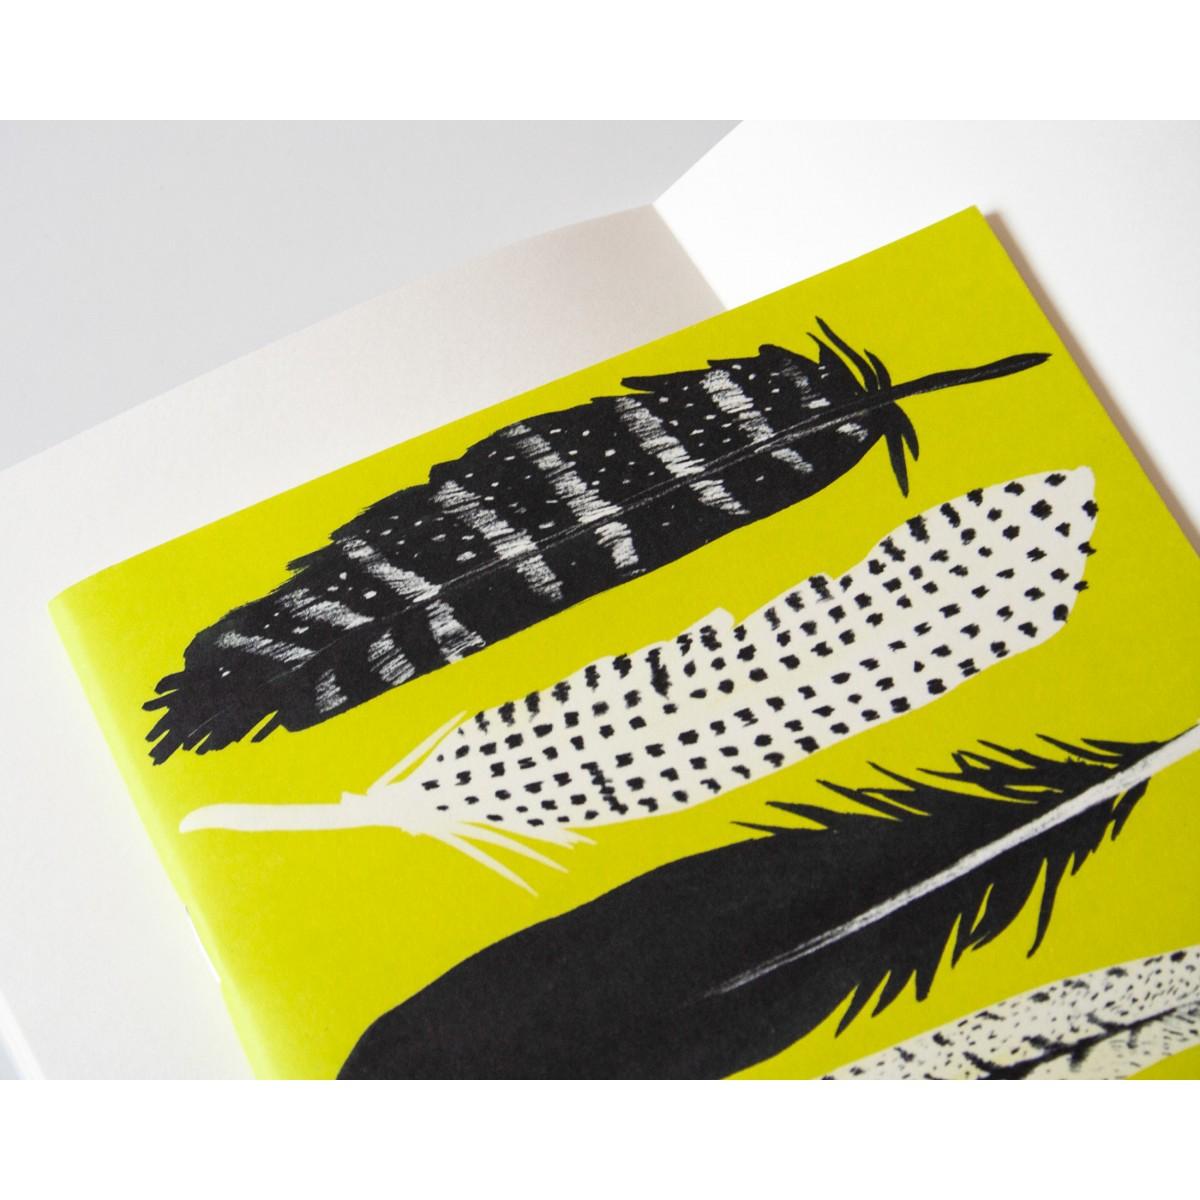 Notizheft A5 Federn gelb // Papaya paper products